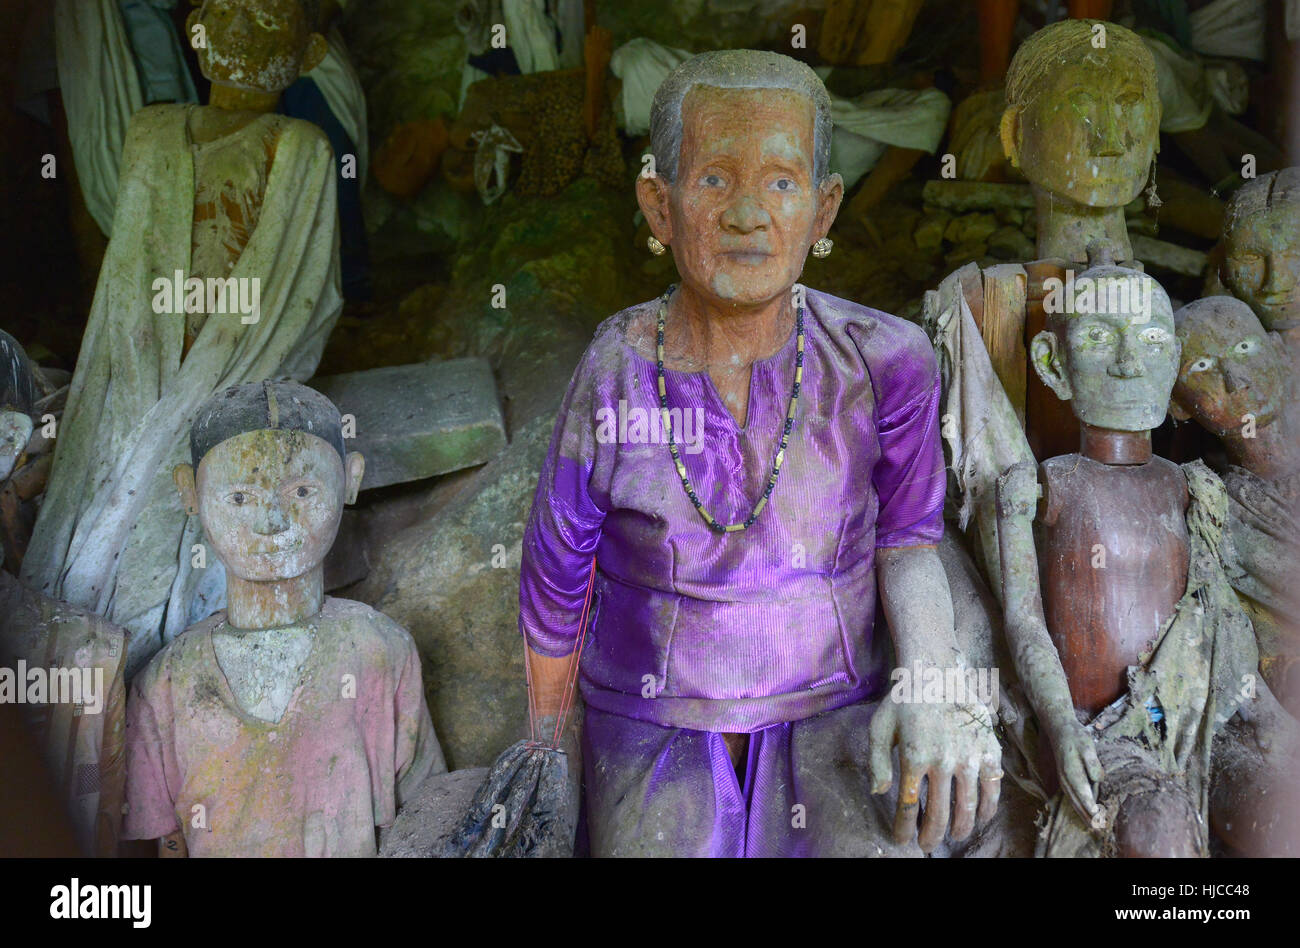 Tana Toraja Cemetery in Kete Kesu, Sulawesi, Indonesia - Stock Image